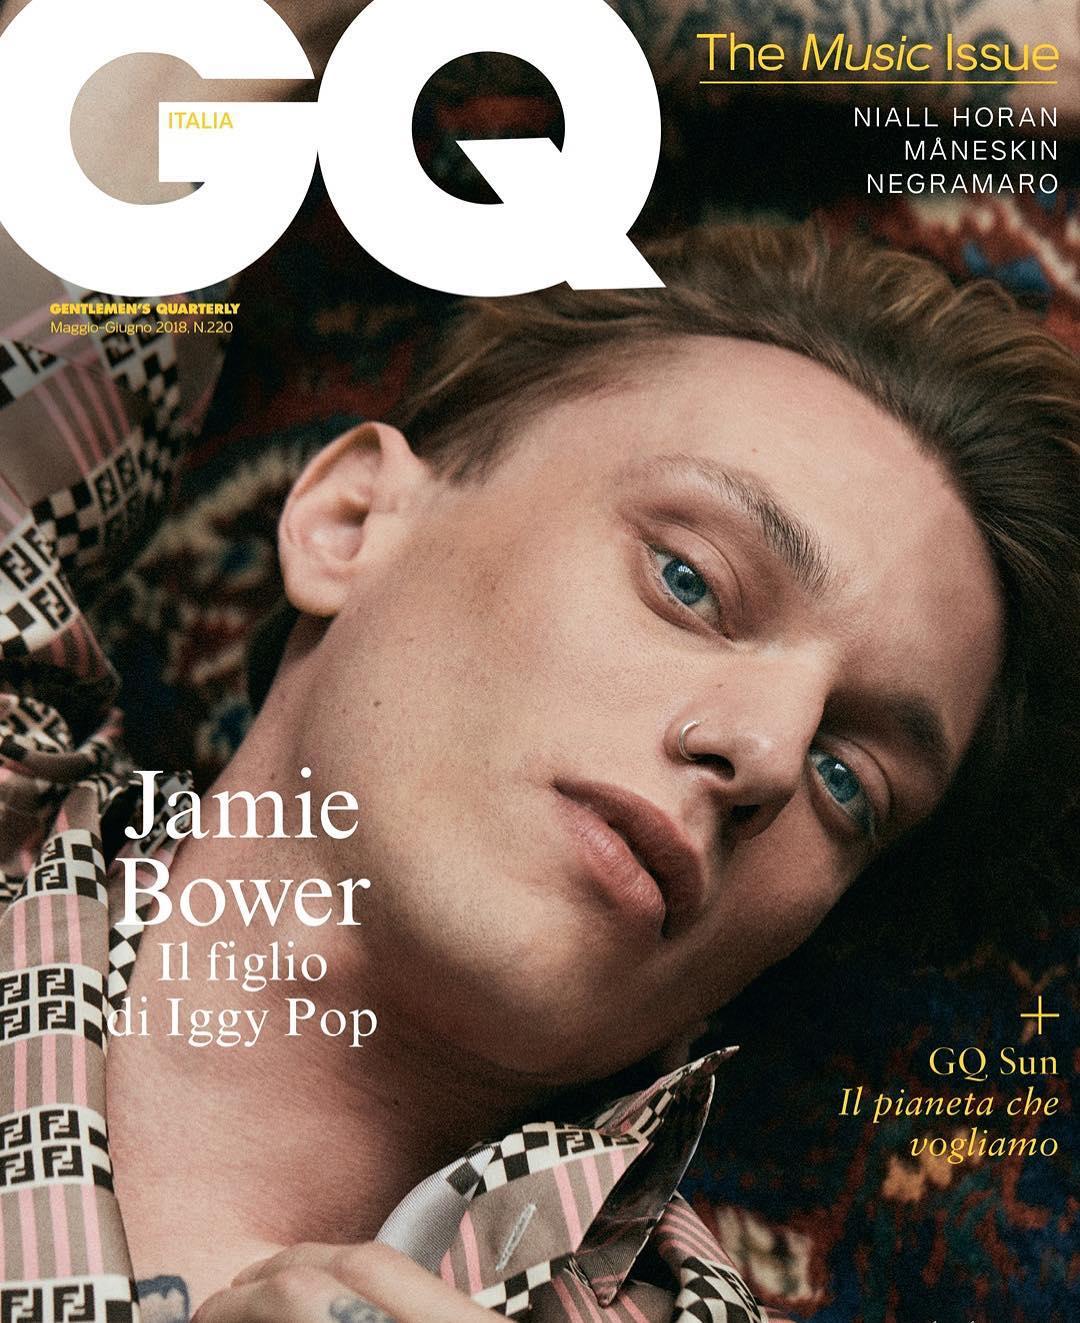 GQ Italia 2018 - Jamie Bower - Grooming Massimo Serini